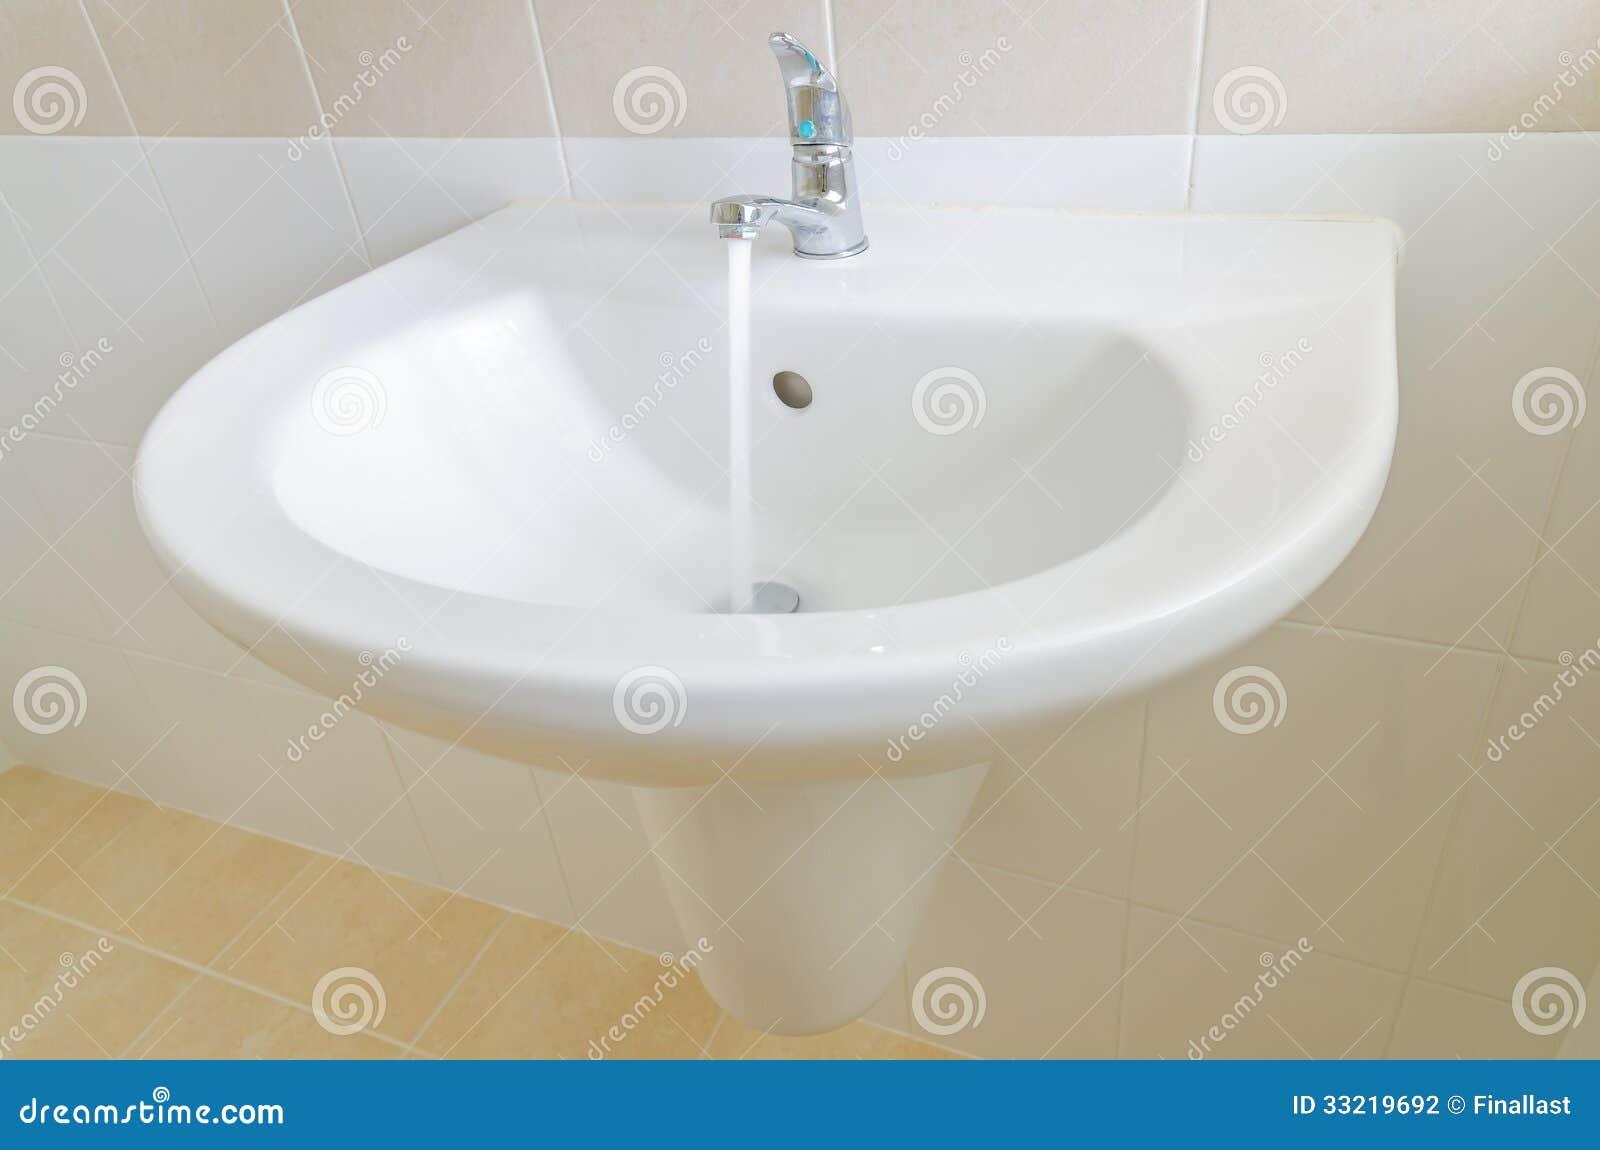 how to clean bristol sink